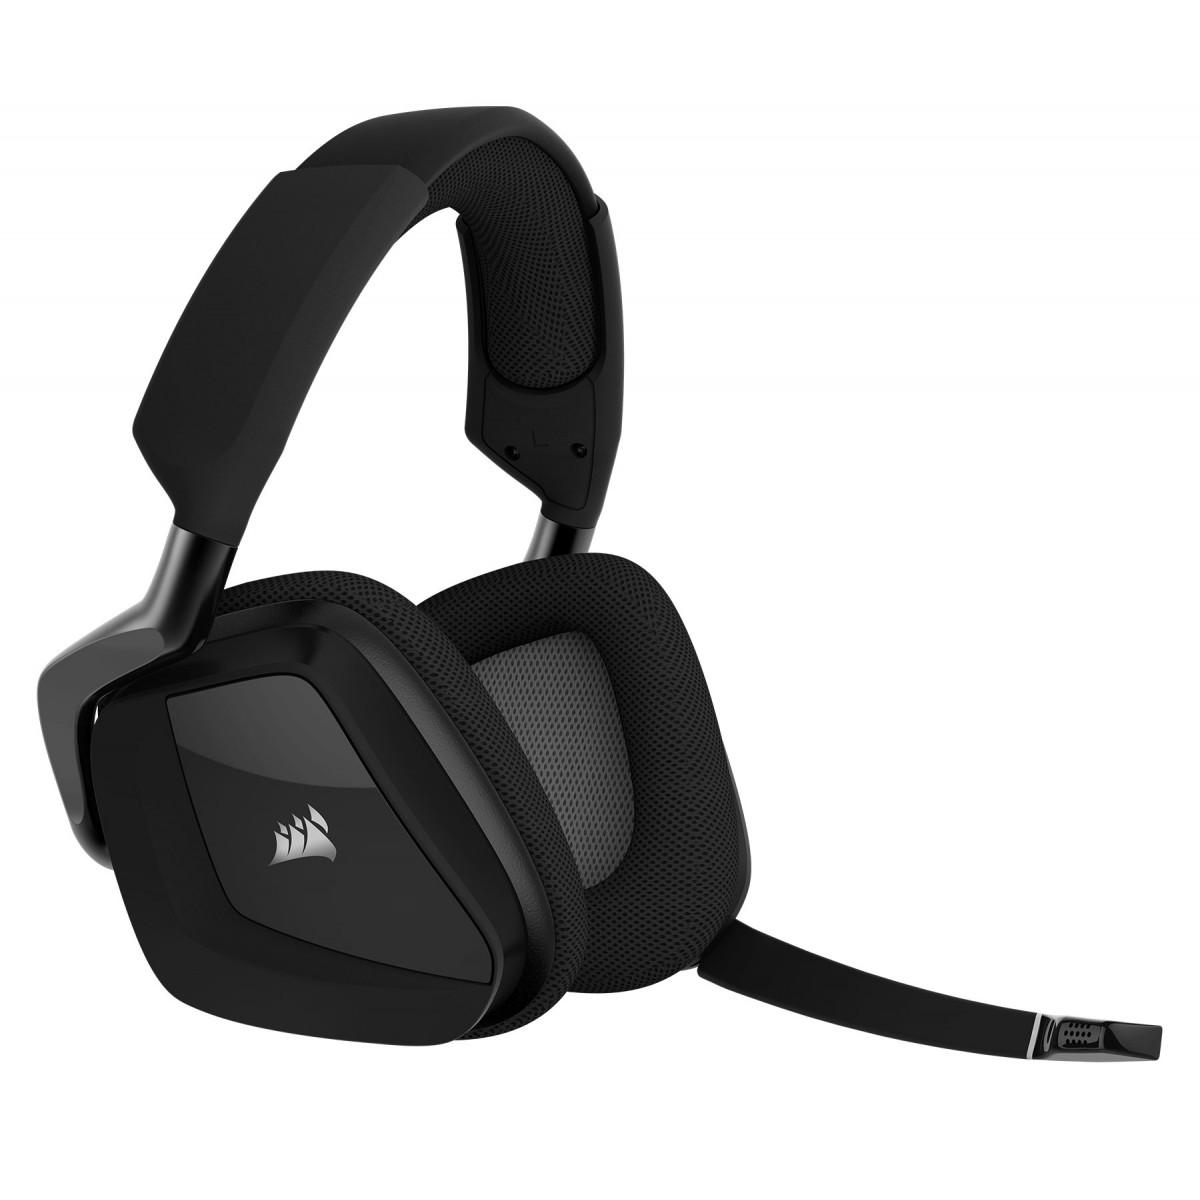 Corsair VOID PRO RGB Wireless 7.1 SE Premium Gaming Headset-Carbon